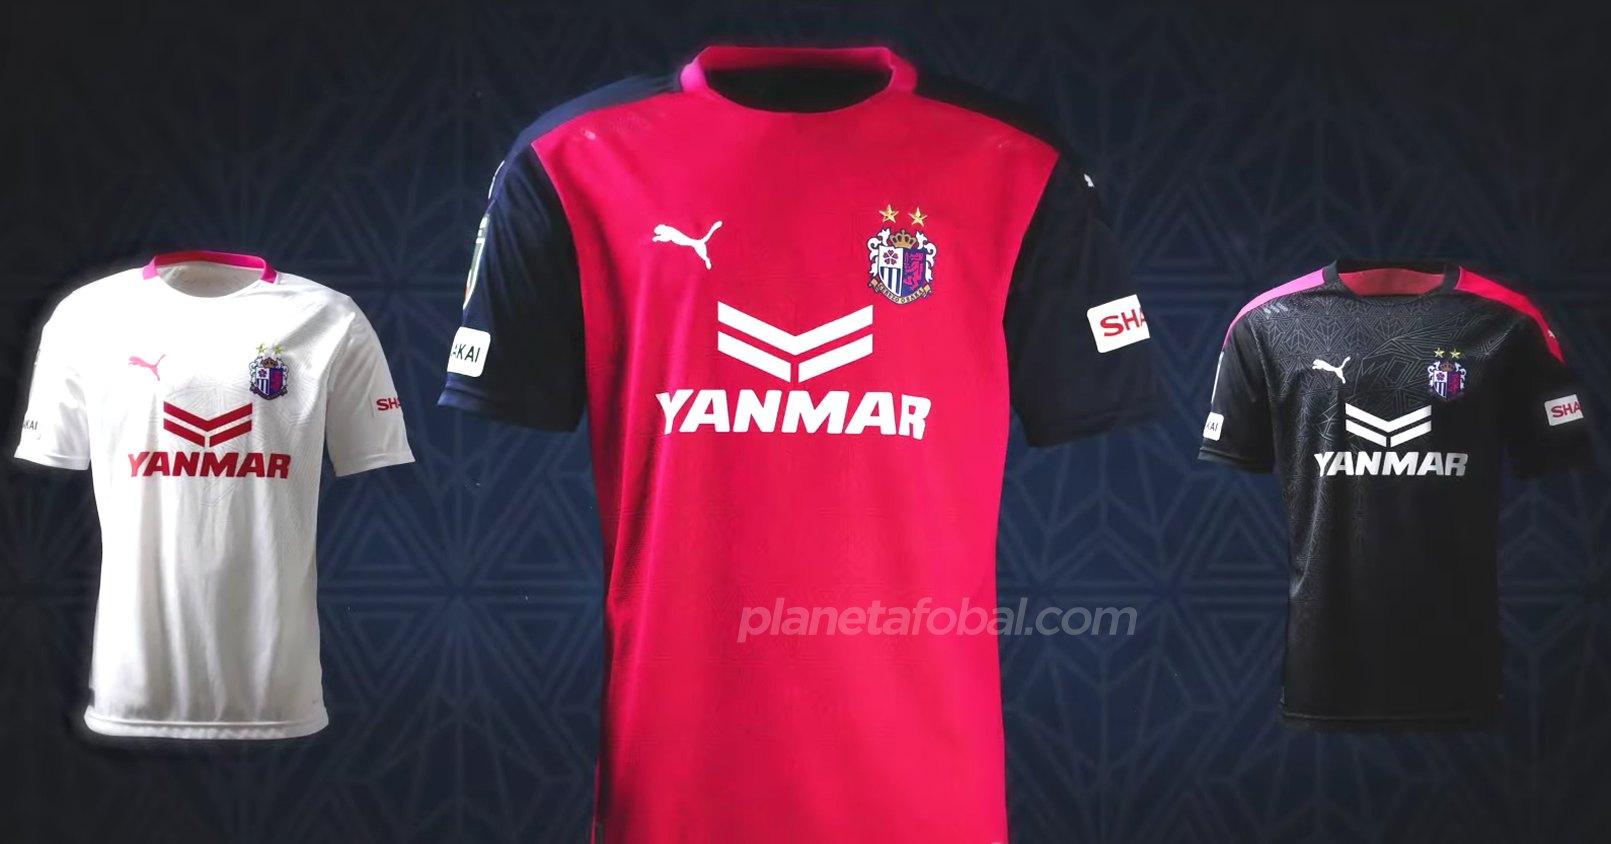 Camisetas Puma del Cerezo Osaka 2020 | Imagen Web Oficial